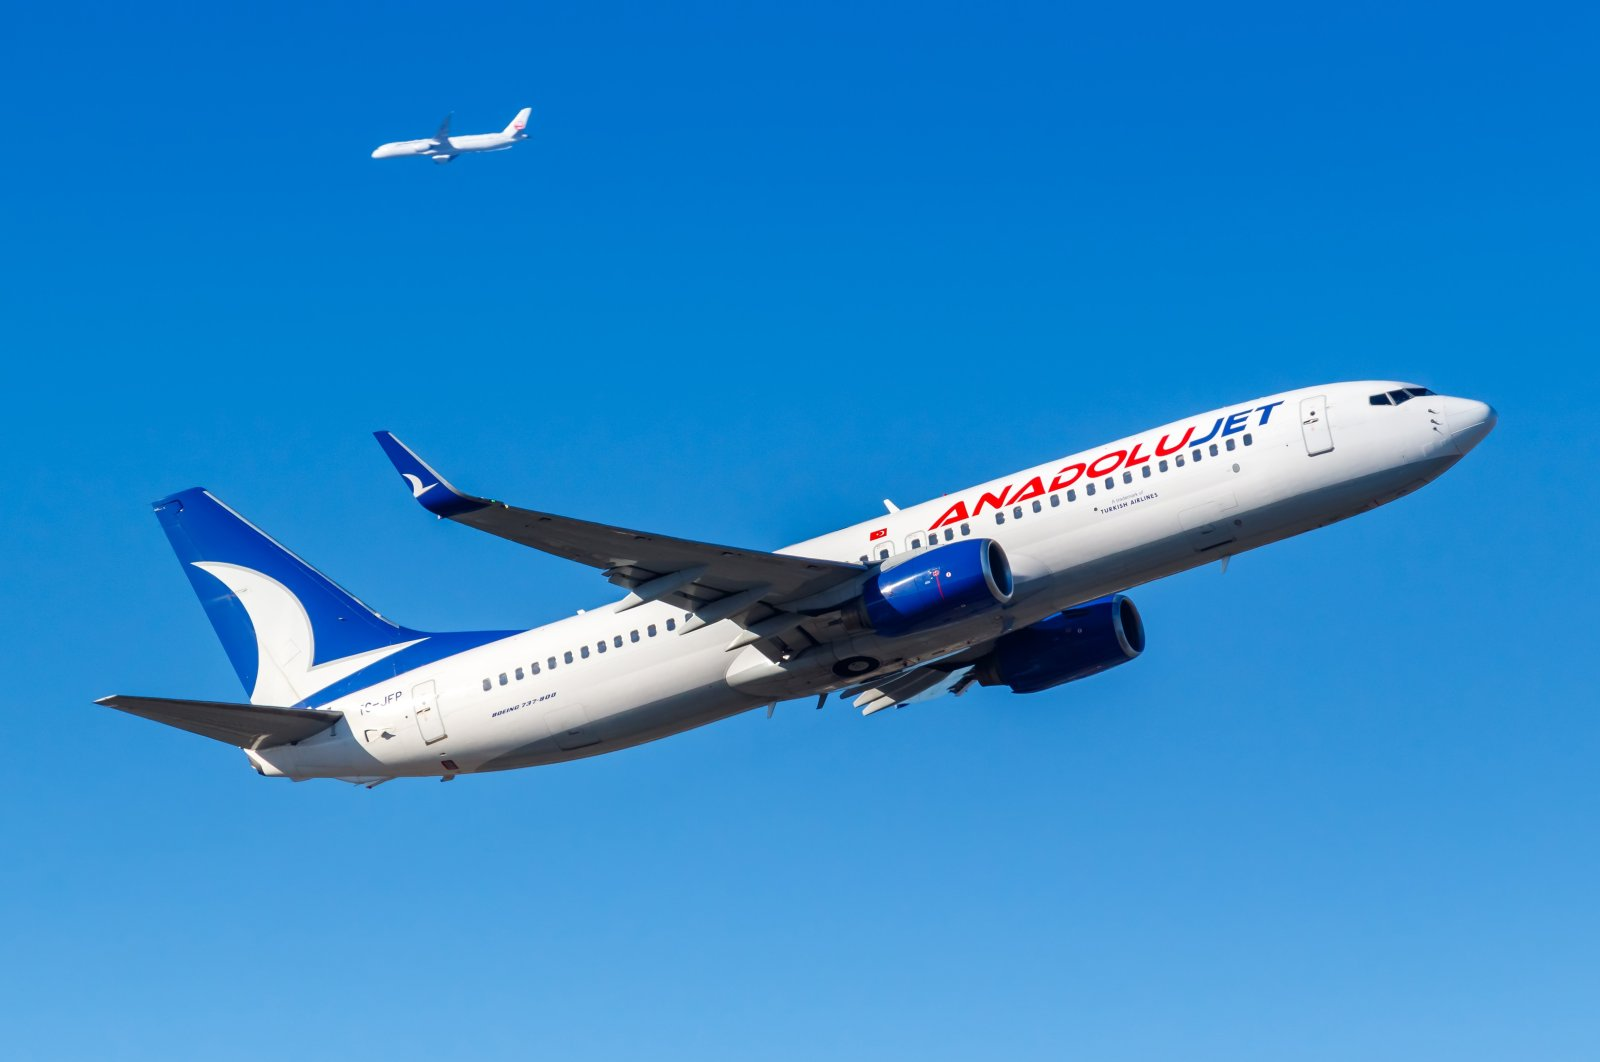 AnadoluJet Boeing 737-800 departsFrankfurt Airport, Germany, Feb. 13, 2021. (Shutterstock Photo)